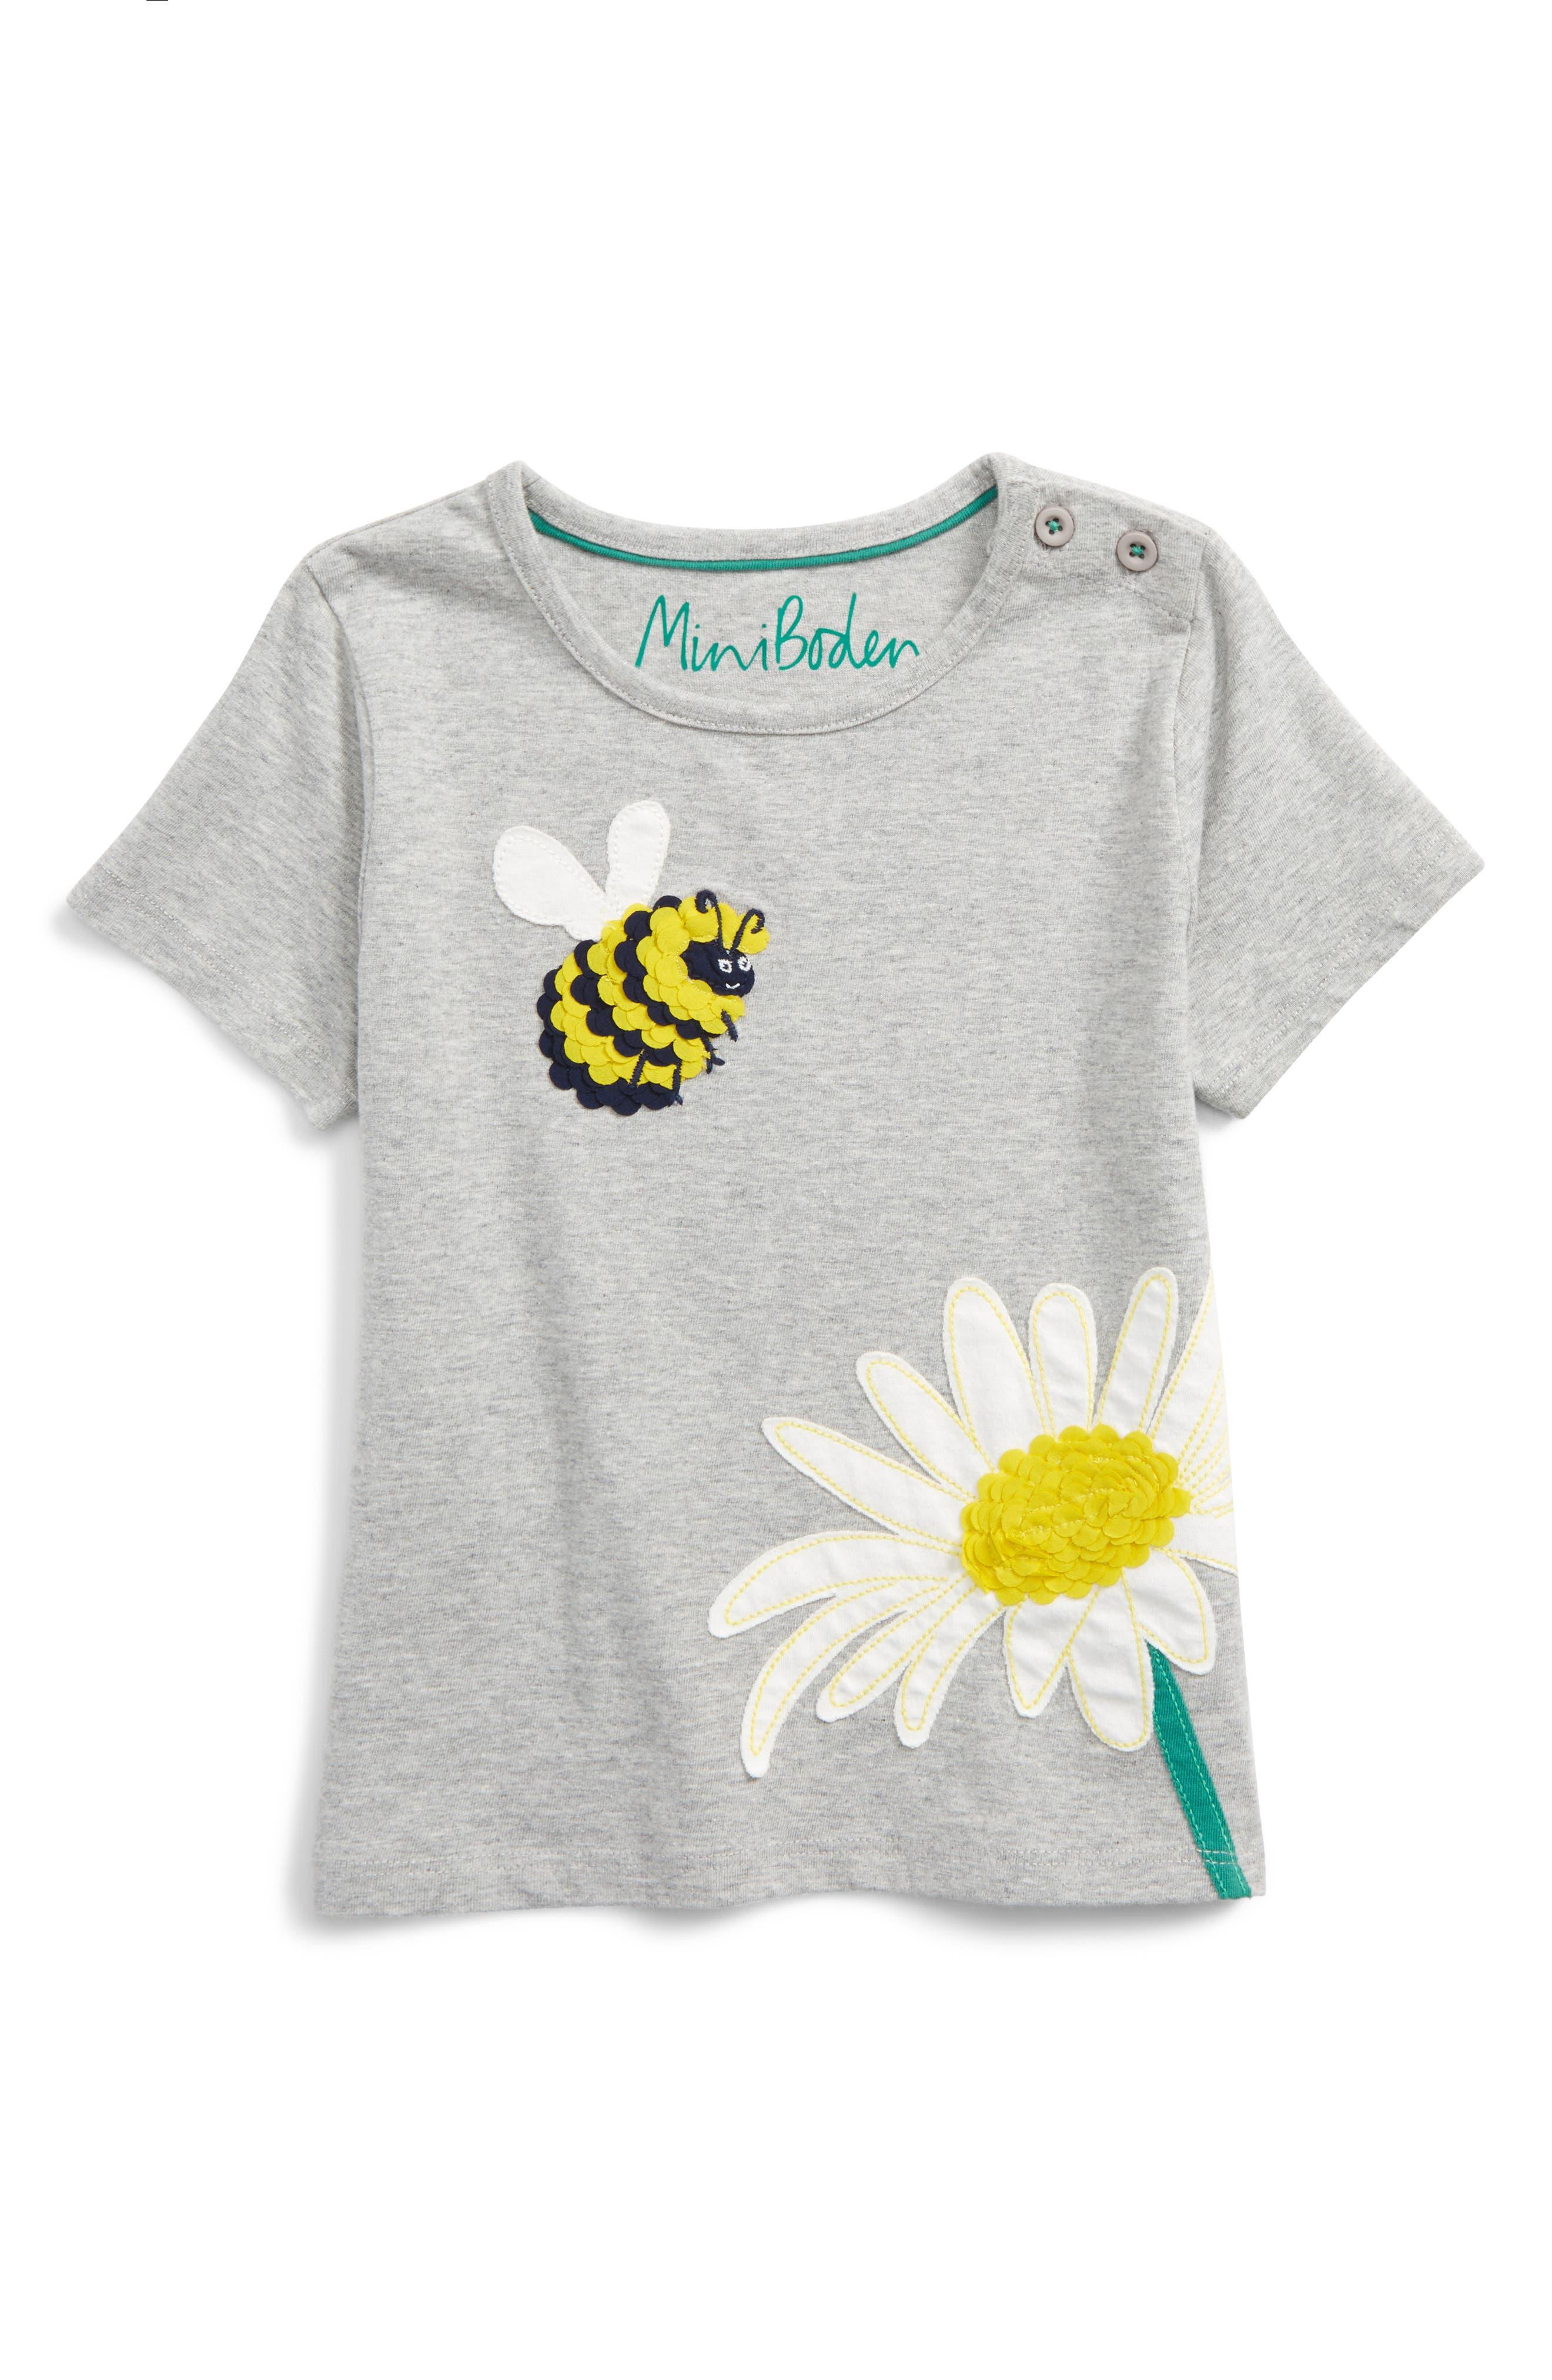 Main Image - Mini Boden Great Outdoors Tee (Toddler Girls, Little Girls & Big Girls)